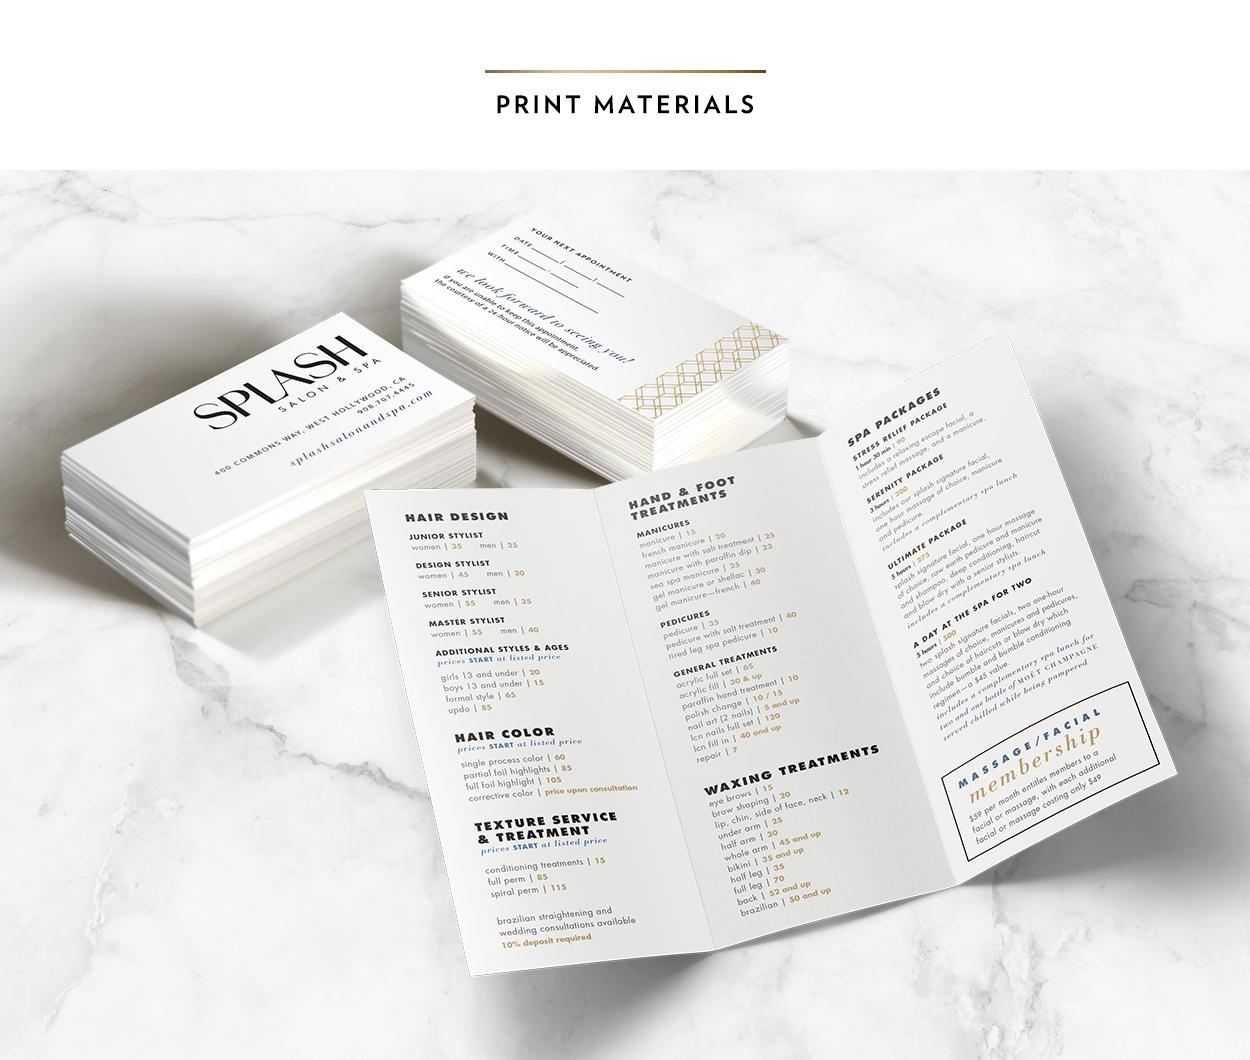 PrintMaterials.jpg